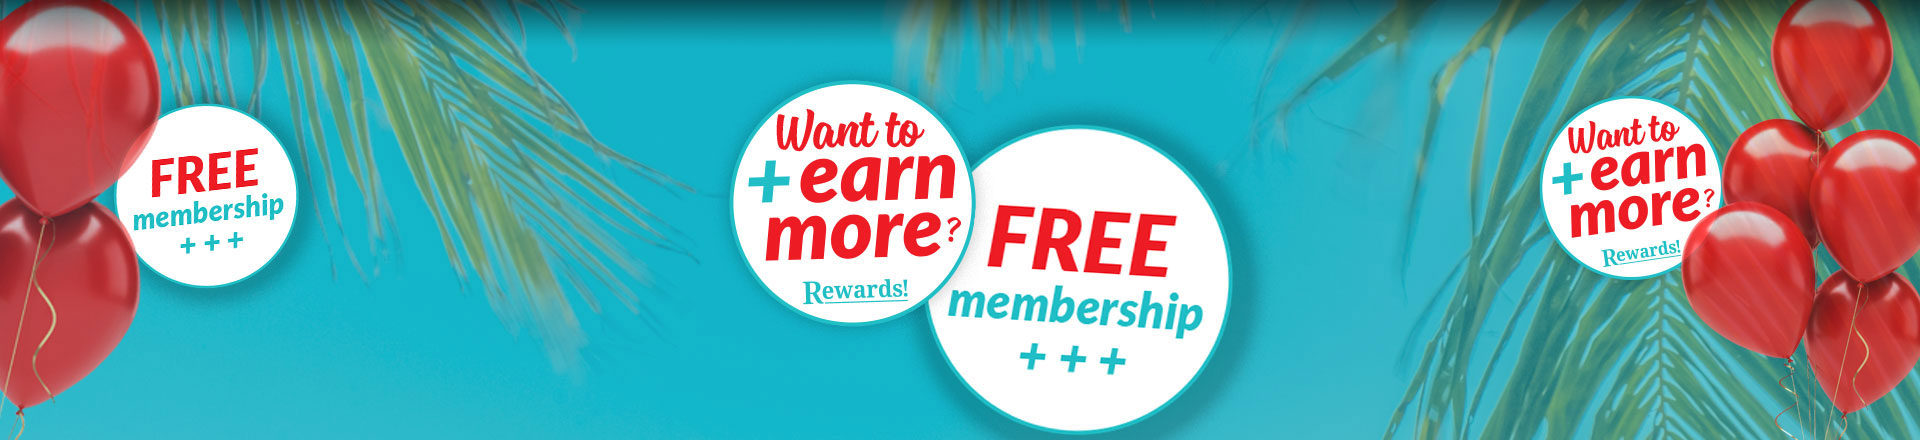 Cost-U-Less Rewards